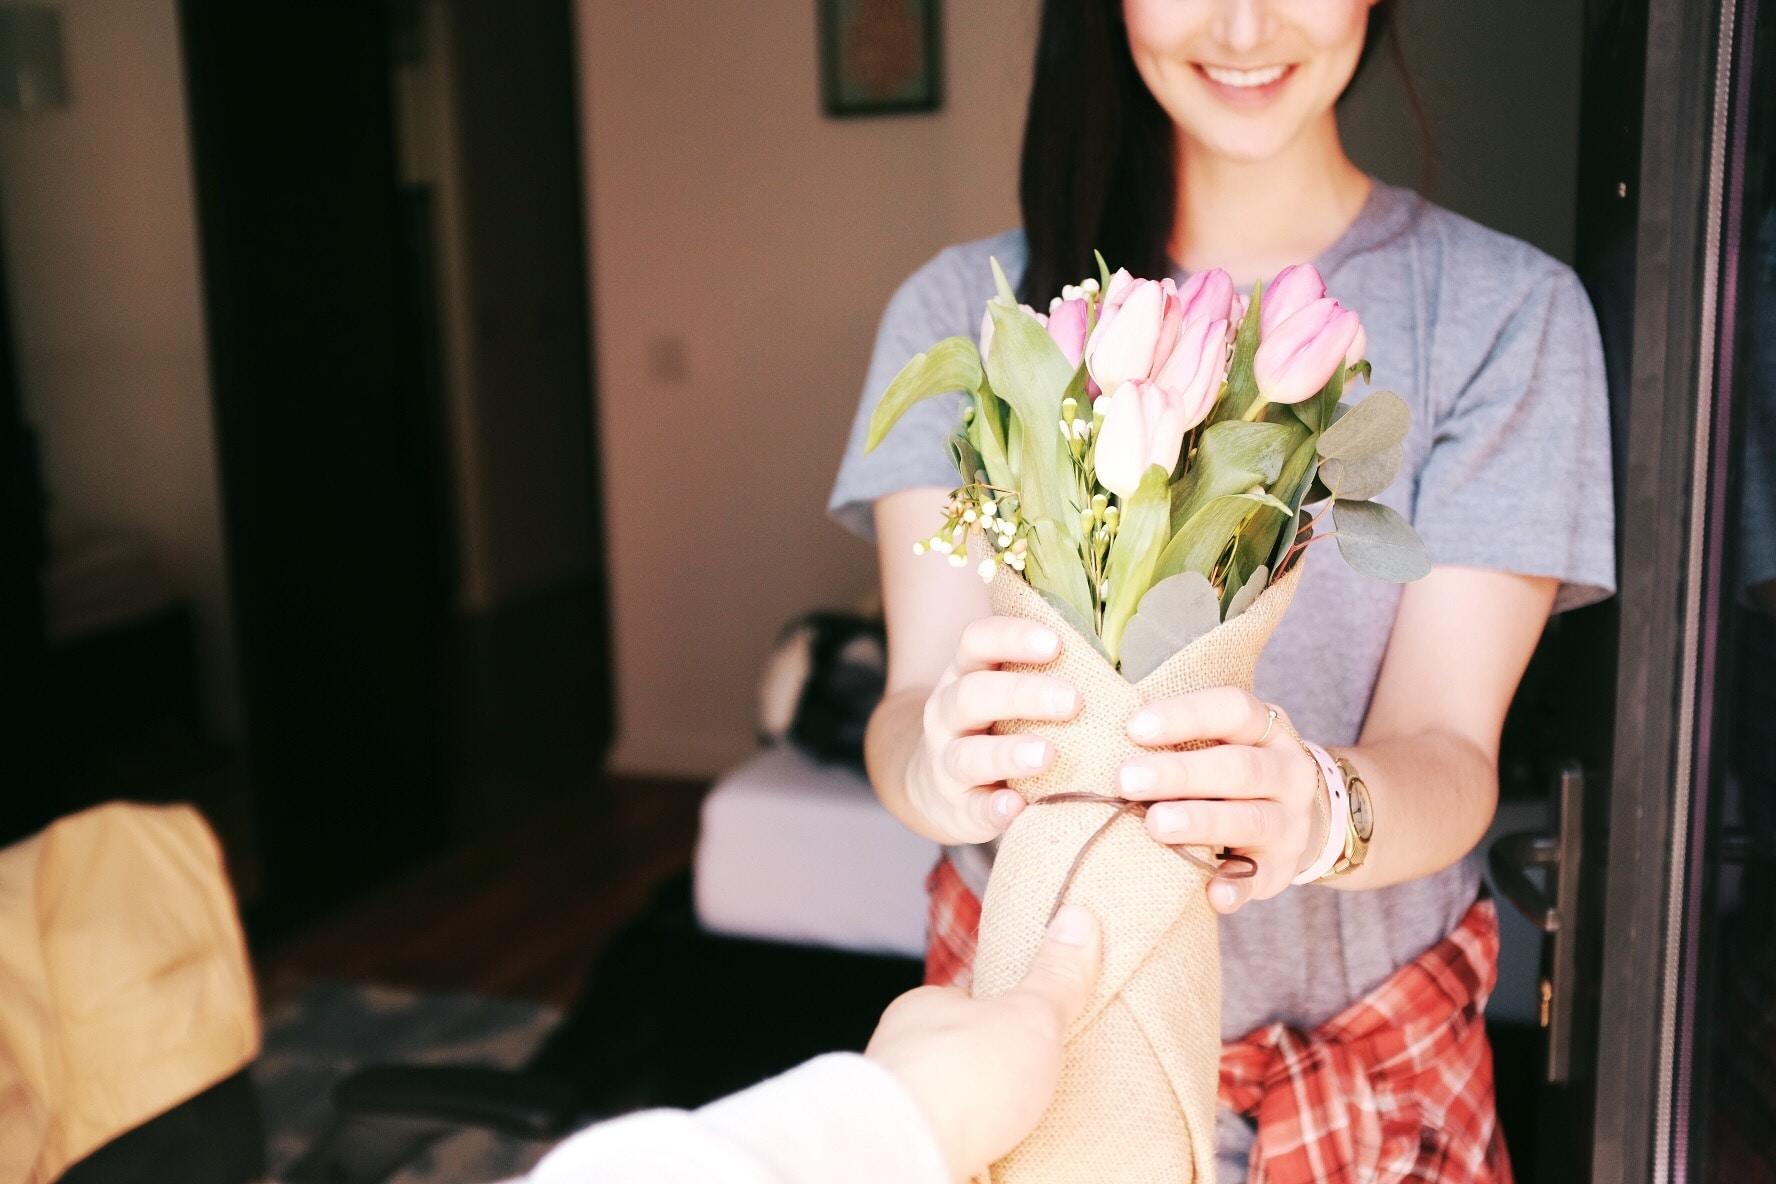 agencja randkowa flower boy 2.bölüm asya fanatikleri